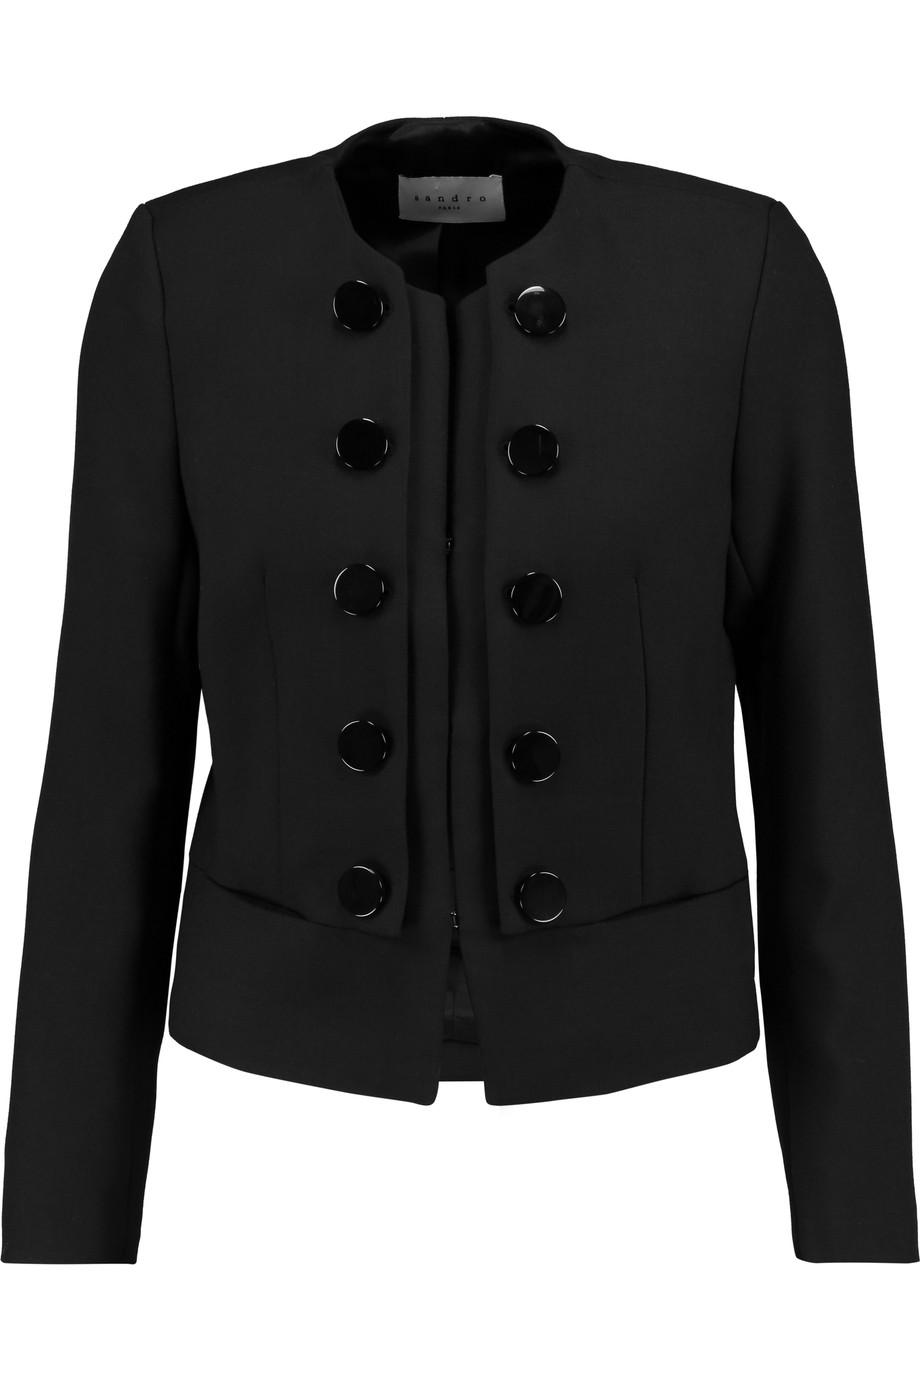 Sandro Veleke twill jacket.jpg